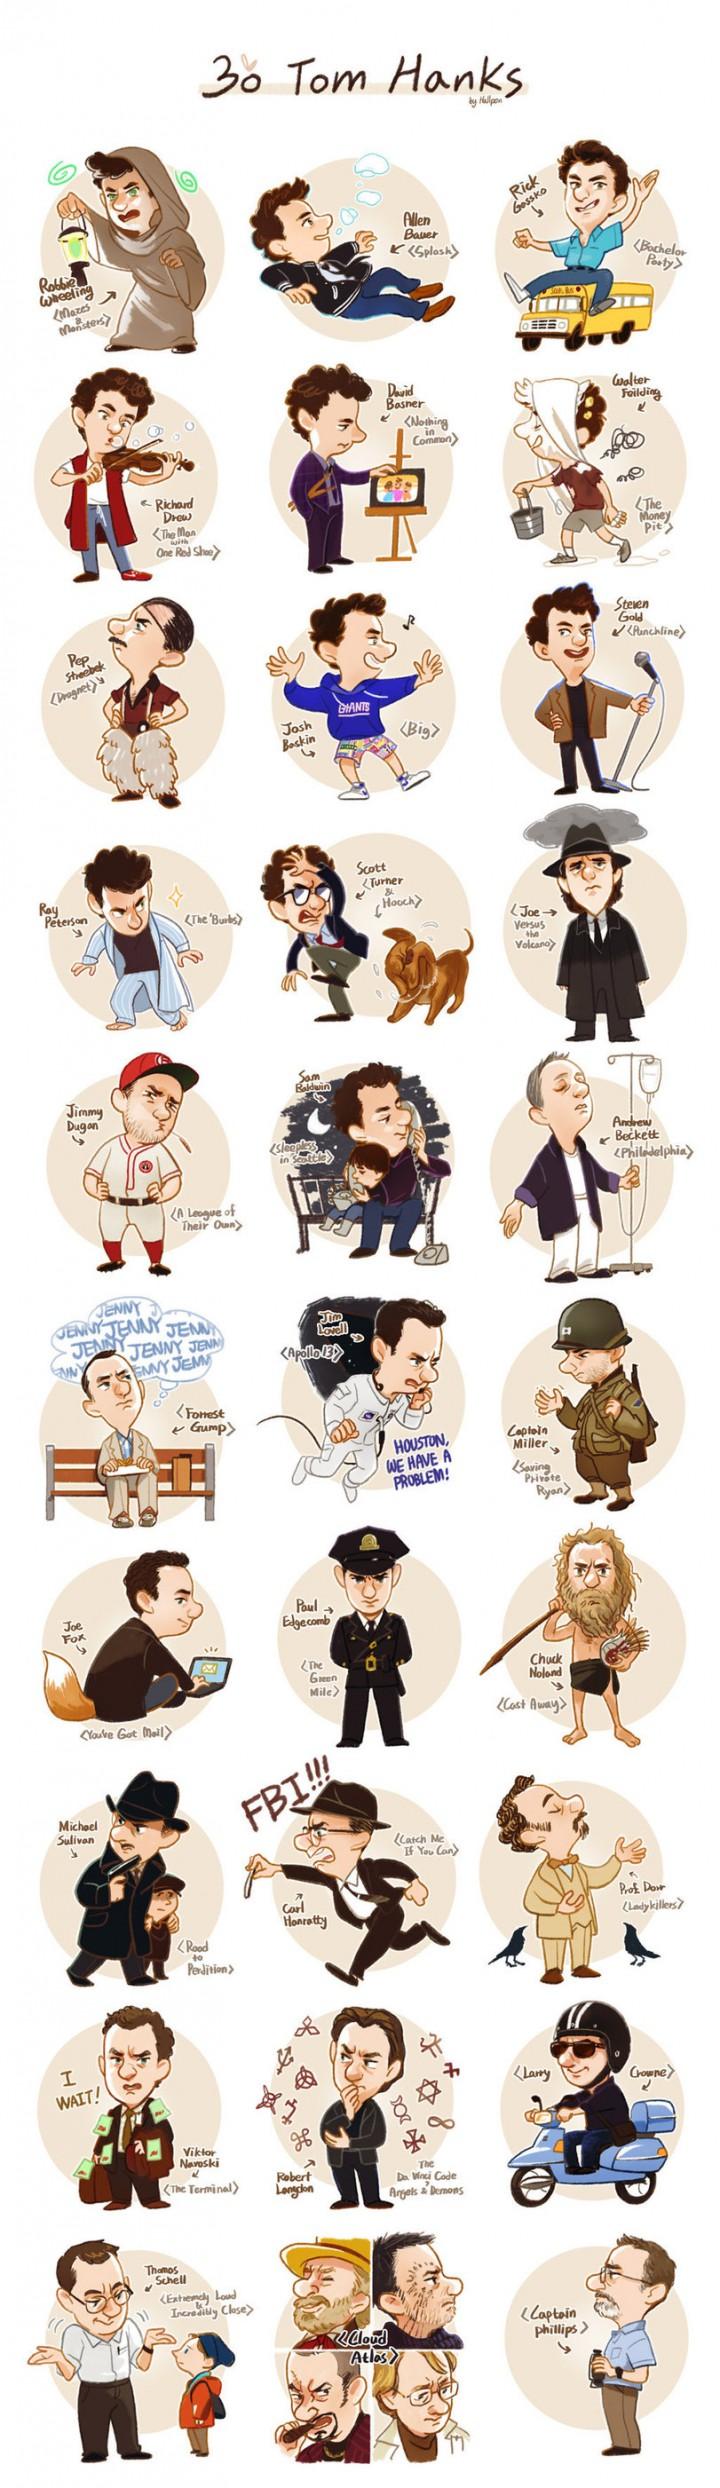 Tom-Hanks-infographie-720x2488